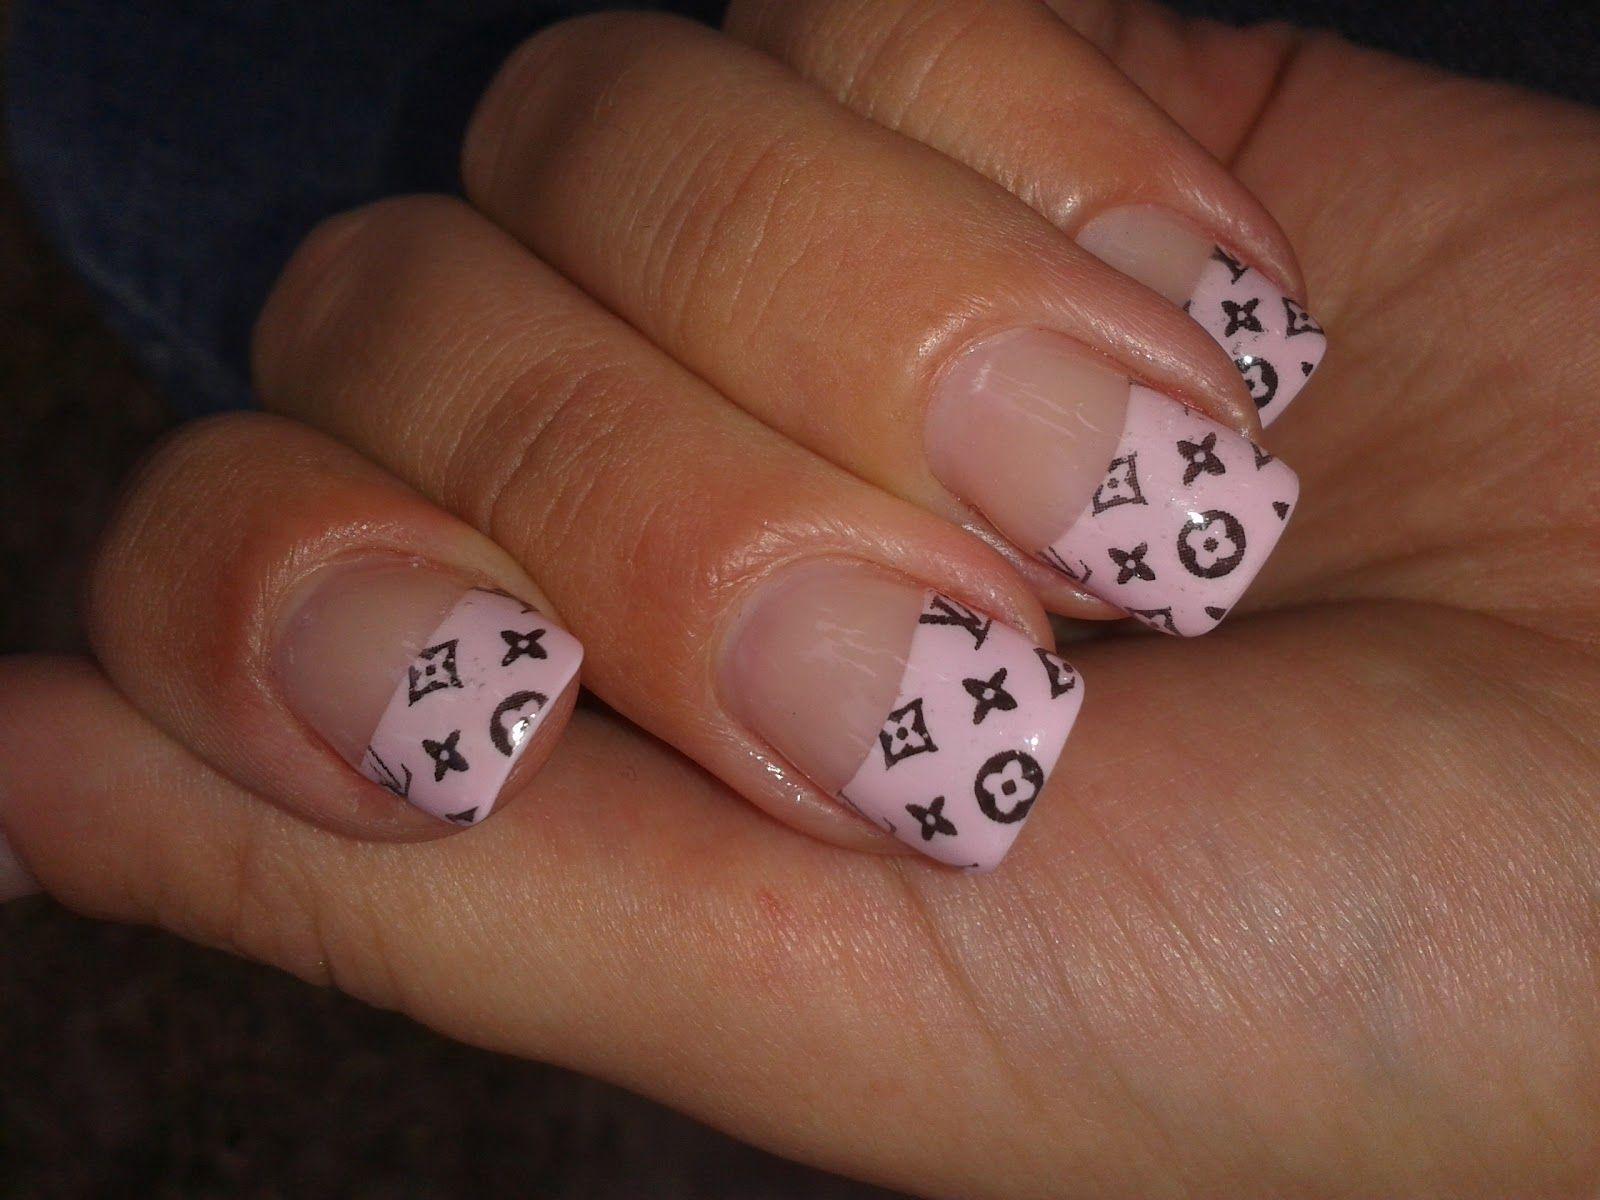 Louis Vuitton Designer Nail Tips | Tinas Strudel: Louis ...